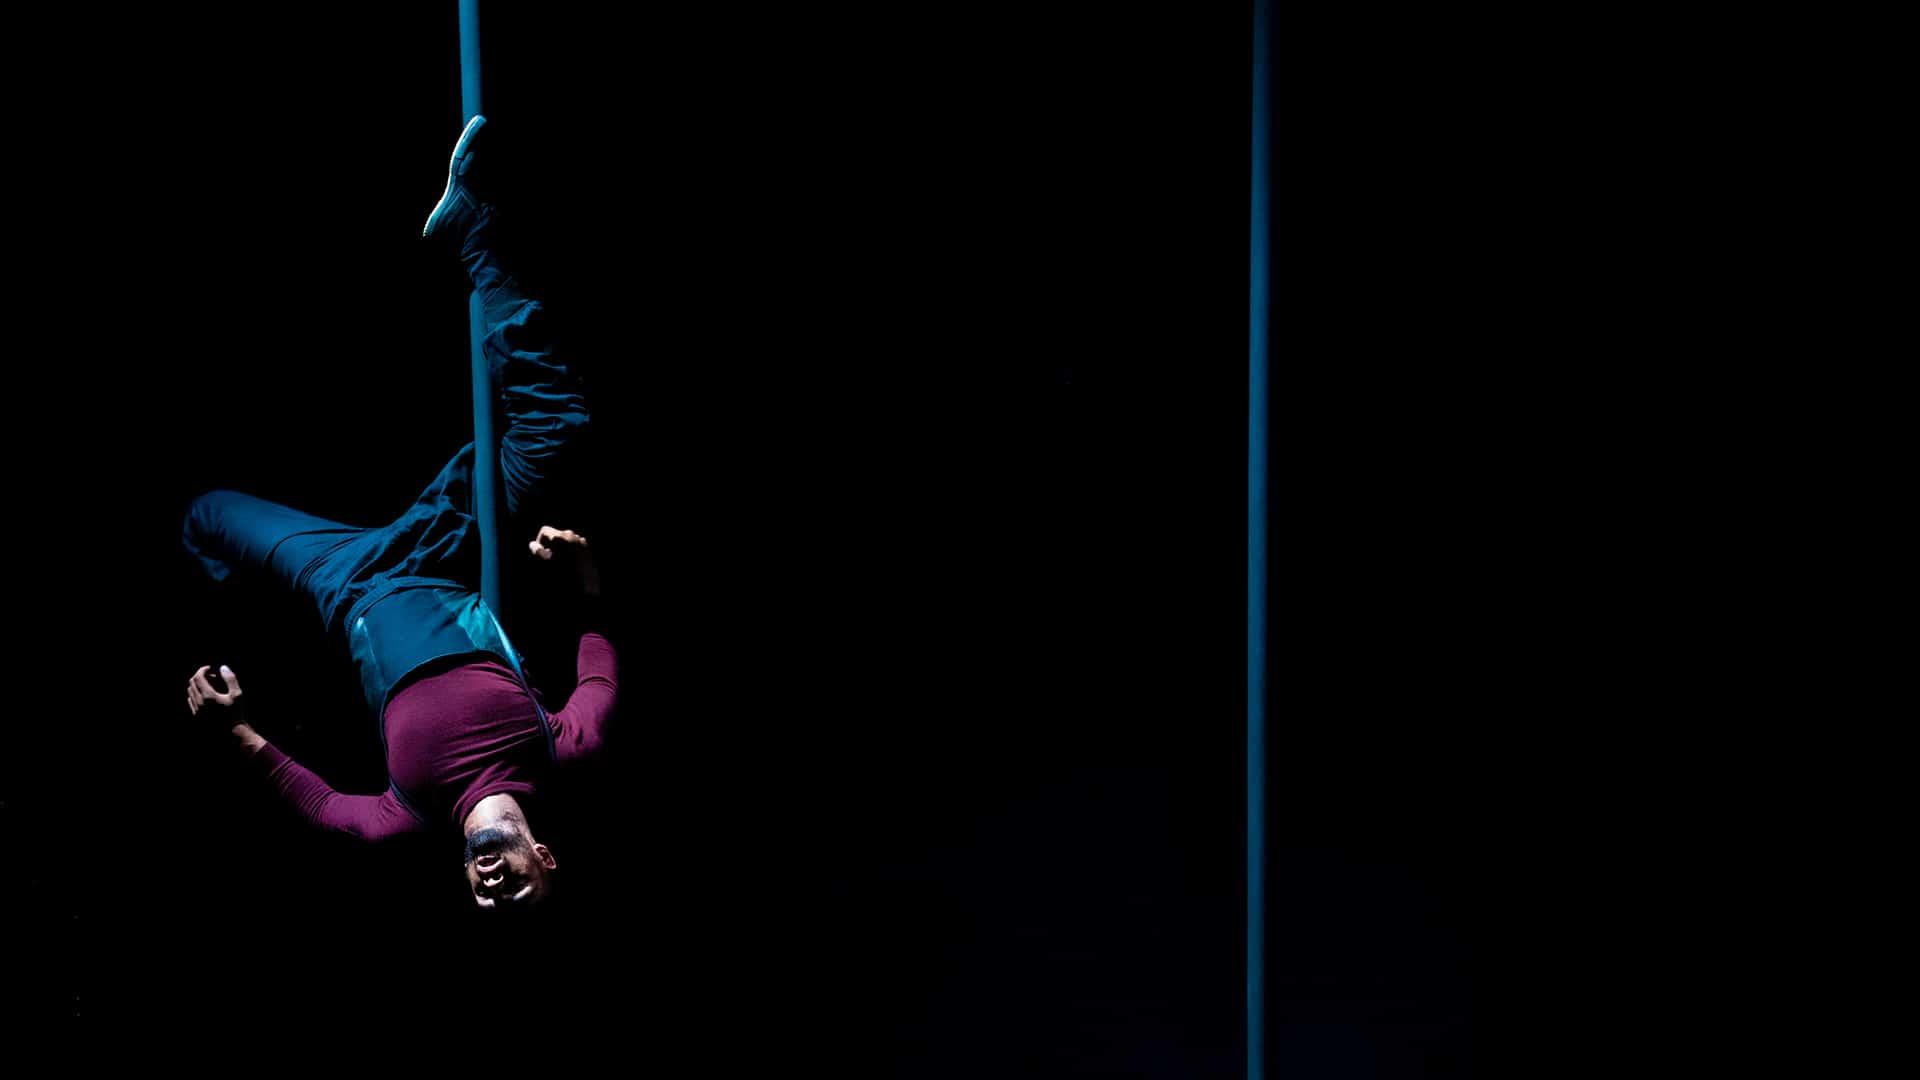 Sadiq Ali hangs upside down from a Chinese pole